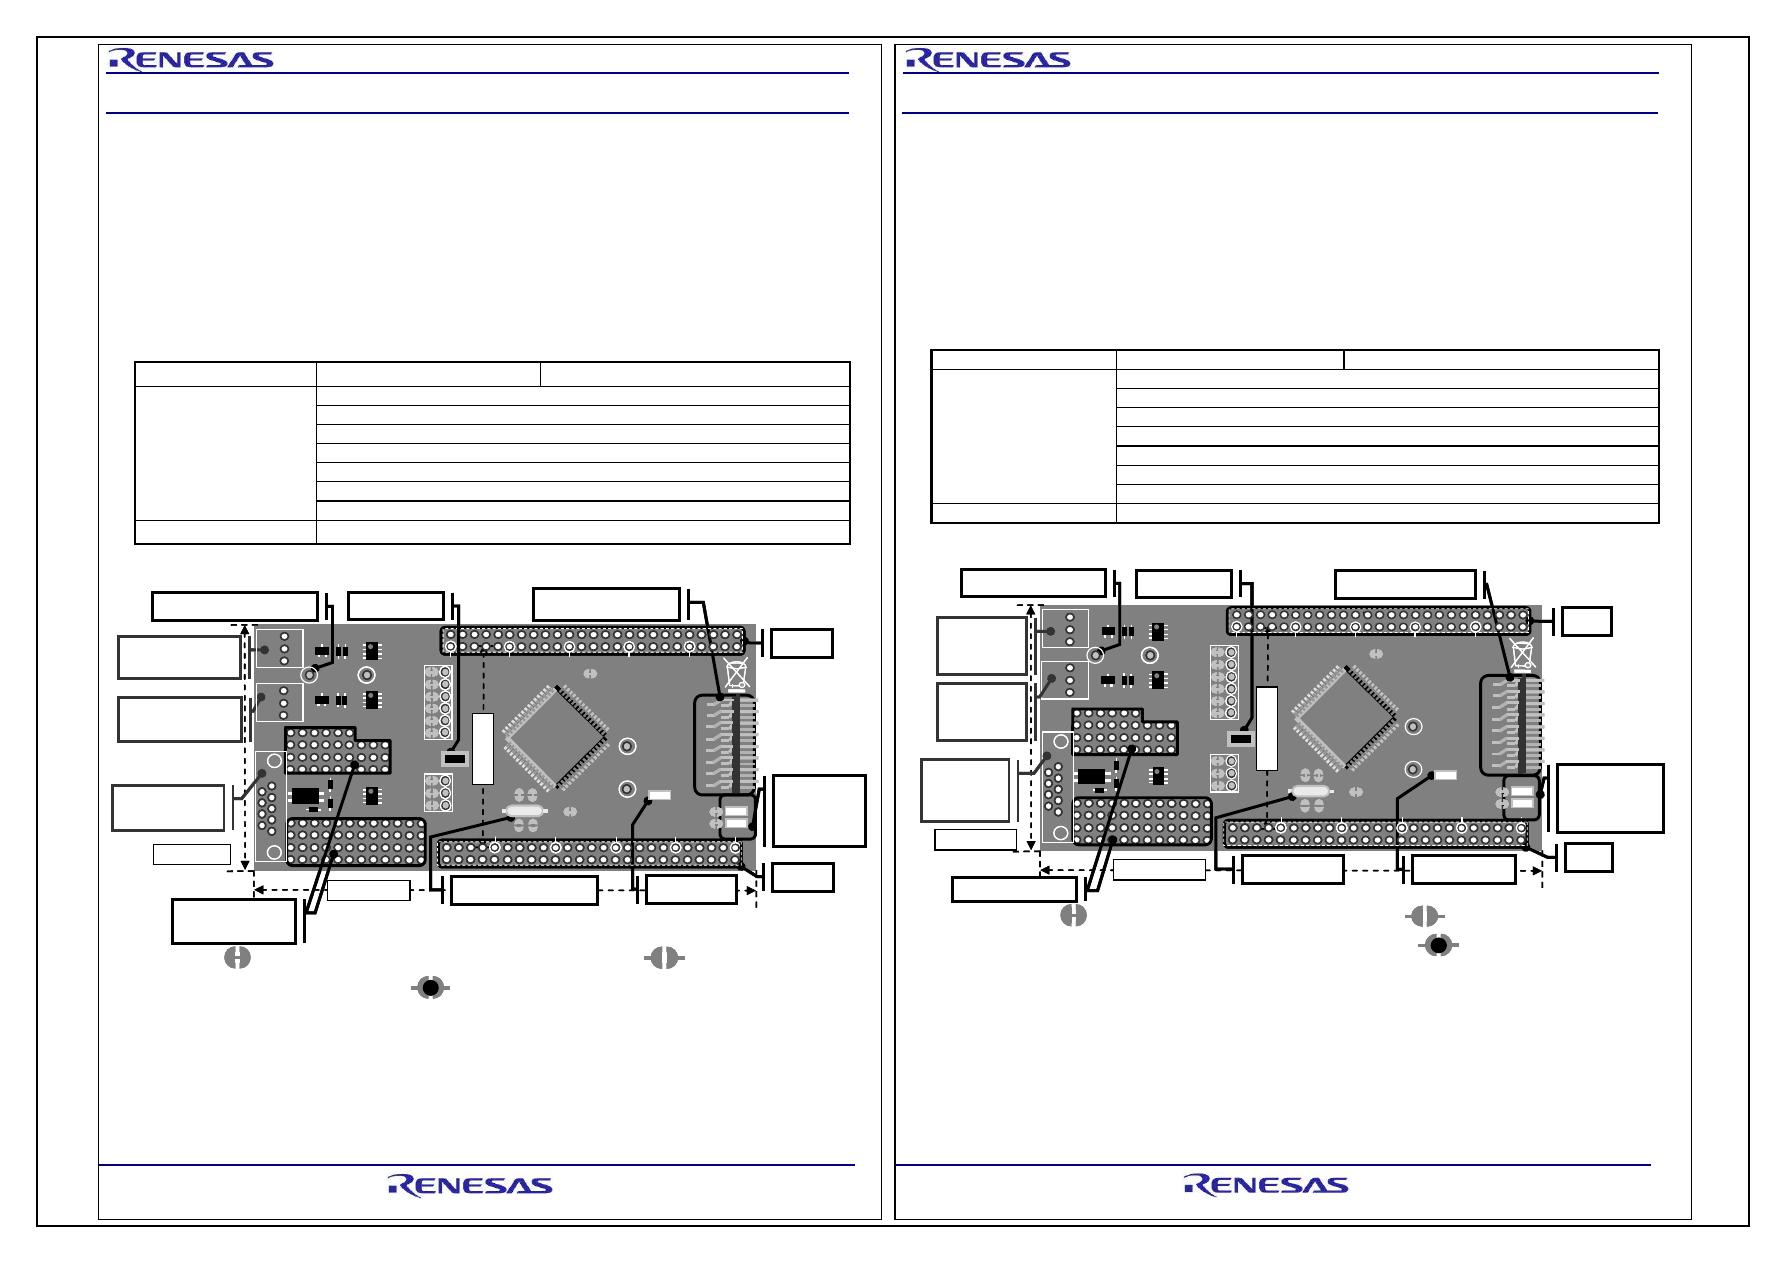 QB-78K0RFG3-TB Datasheet (PDF Download) 1/2 Page - Renesas